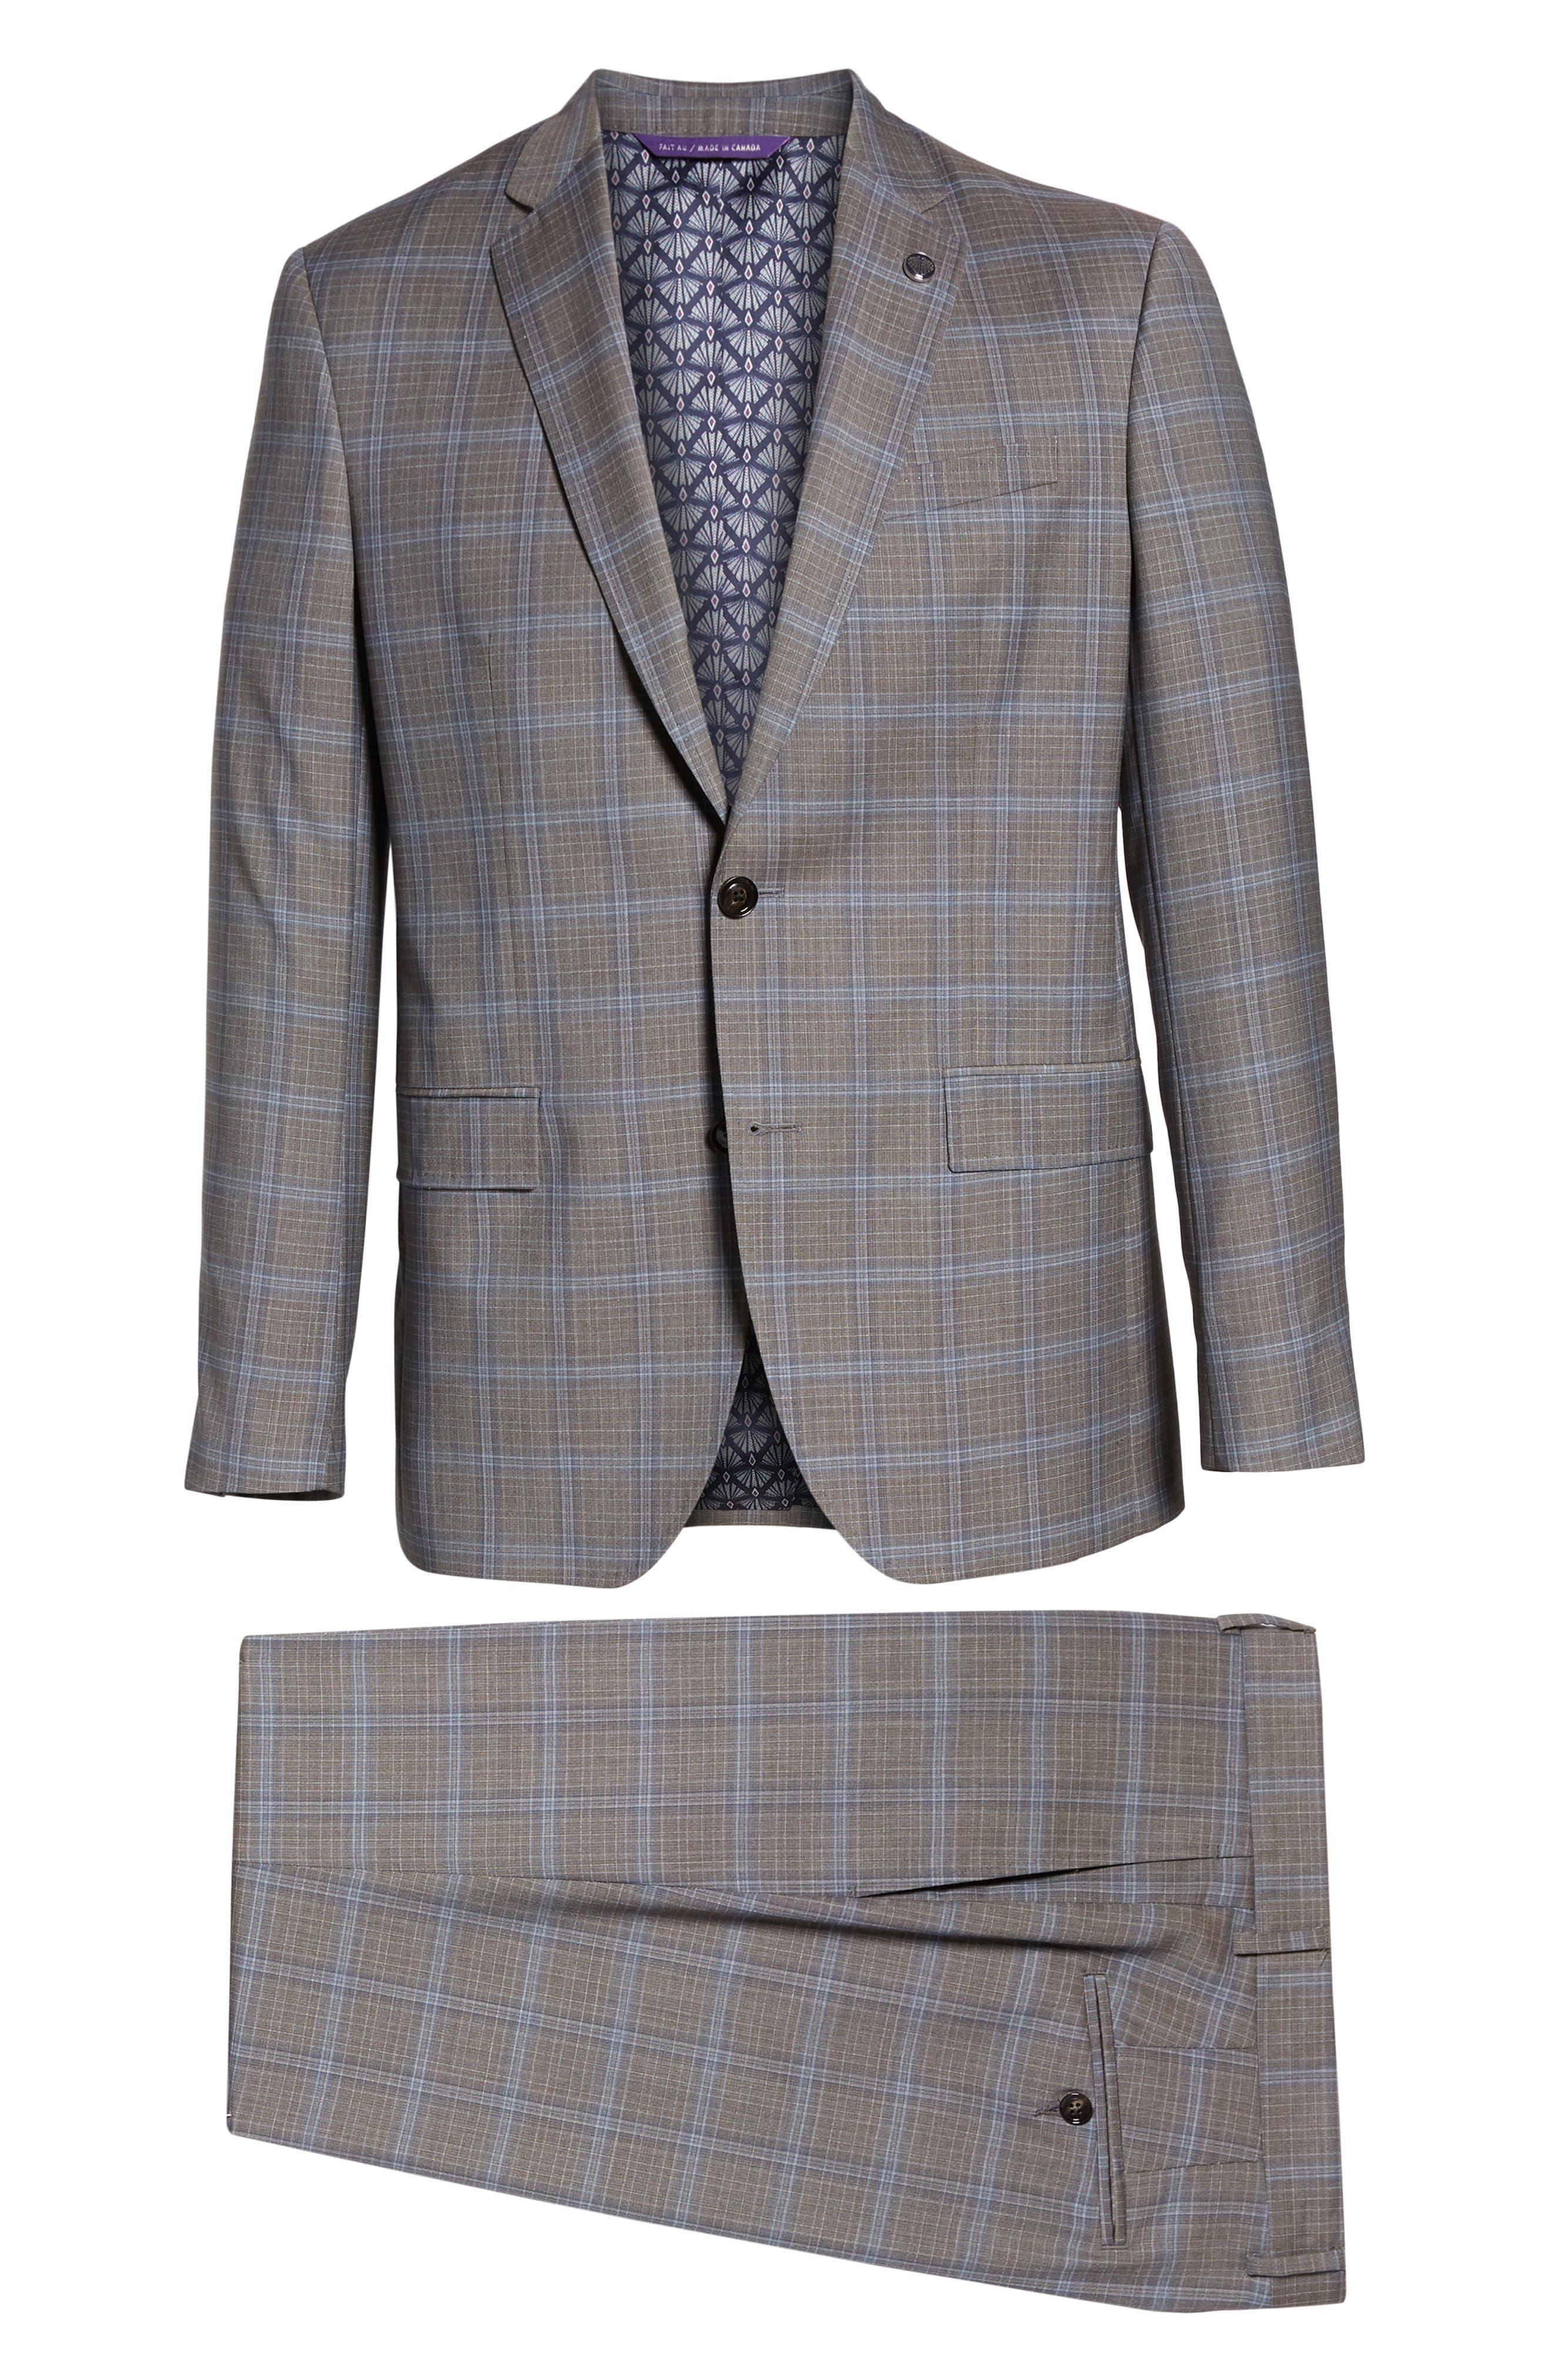 TED BAKER LONDON, Jay Trim Fit Plaid Wool Suit, Alternate thumbnail 8, color, LIGHT GREY